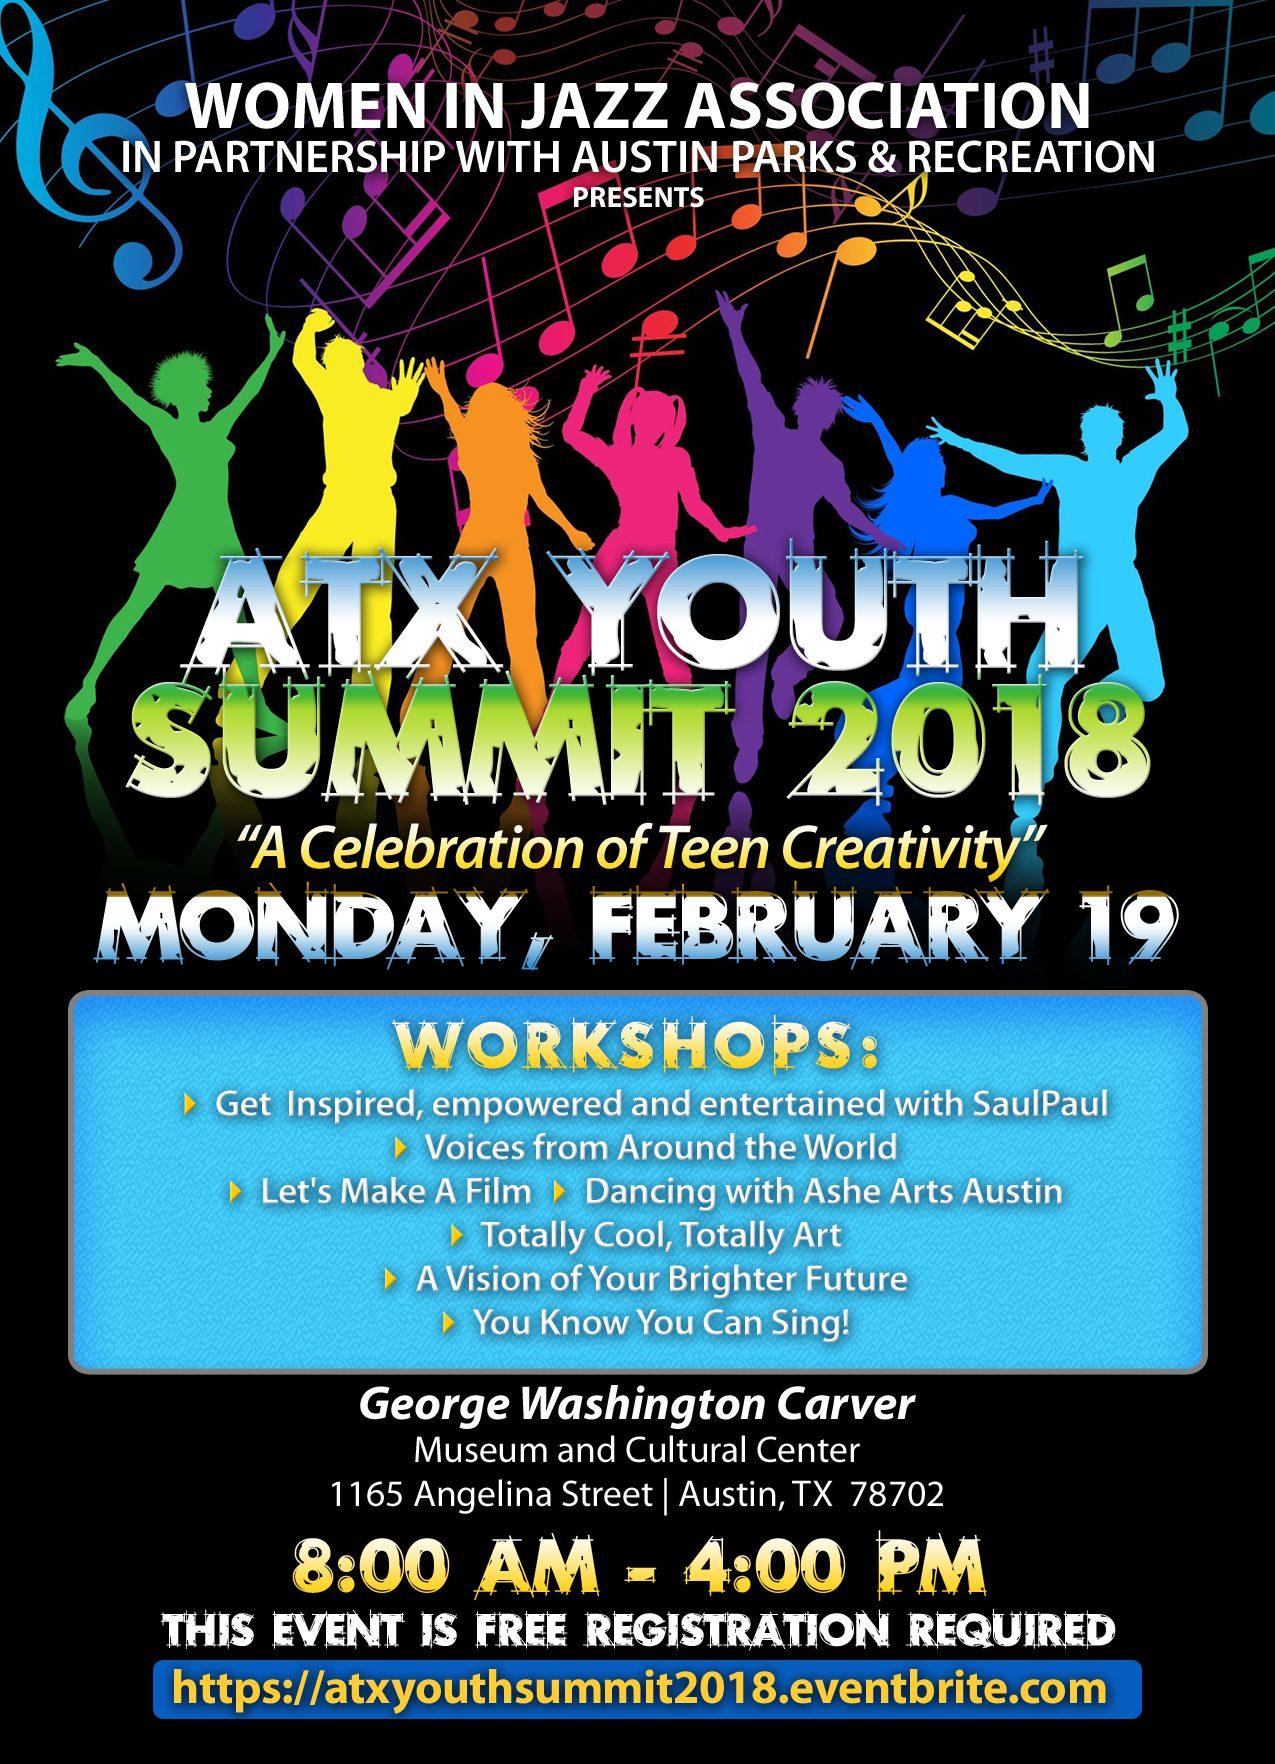 ATX Youth Summit 2018:  A Celebration of Teen Creativity